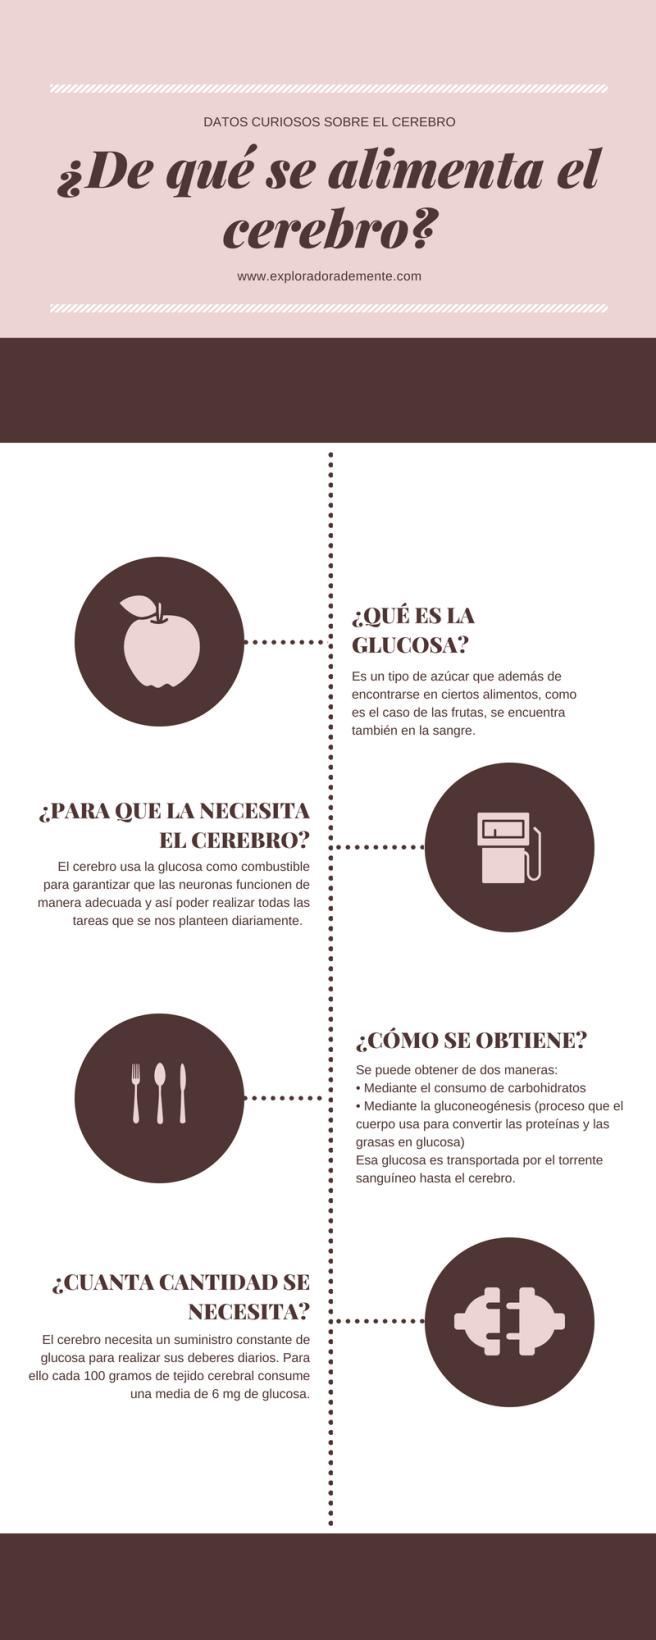 Infografia DE QUE SE ALIMENTA EL CEREBRO